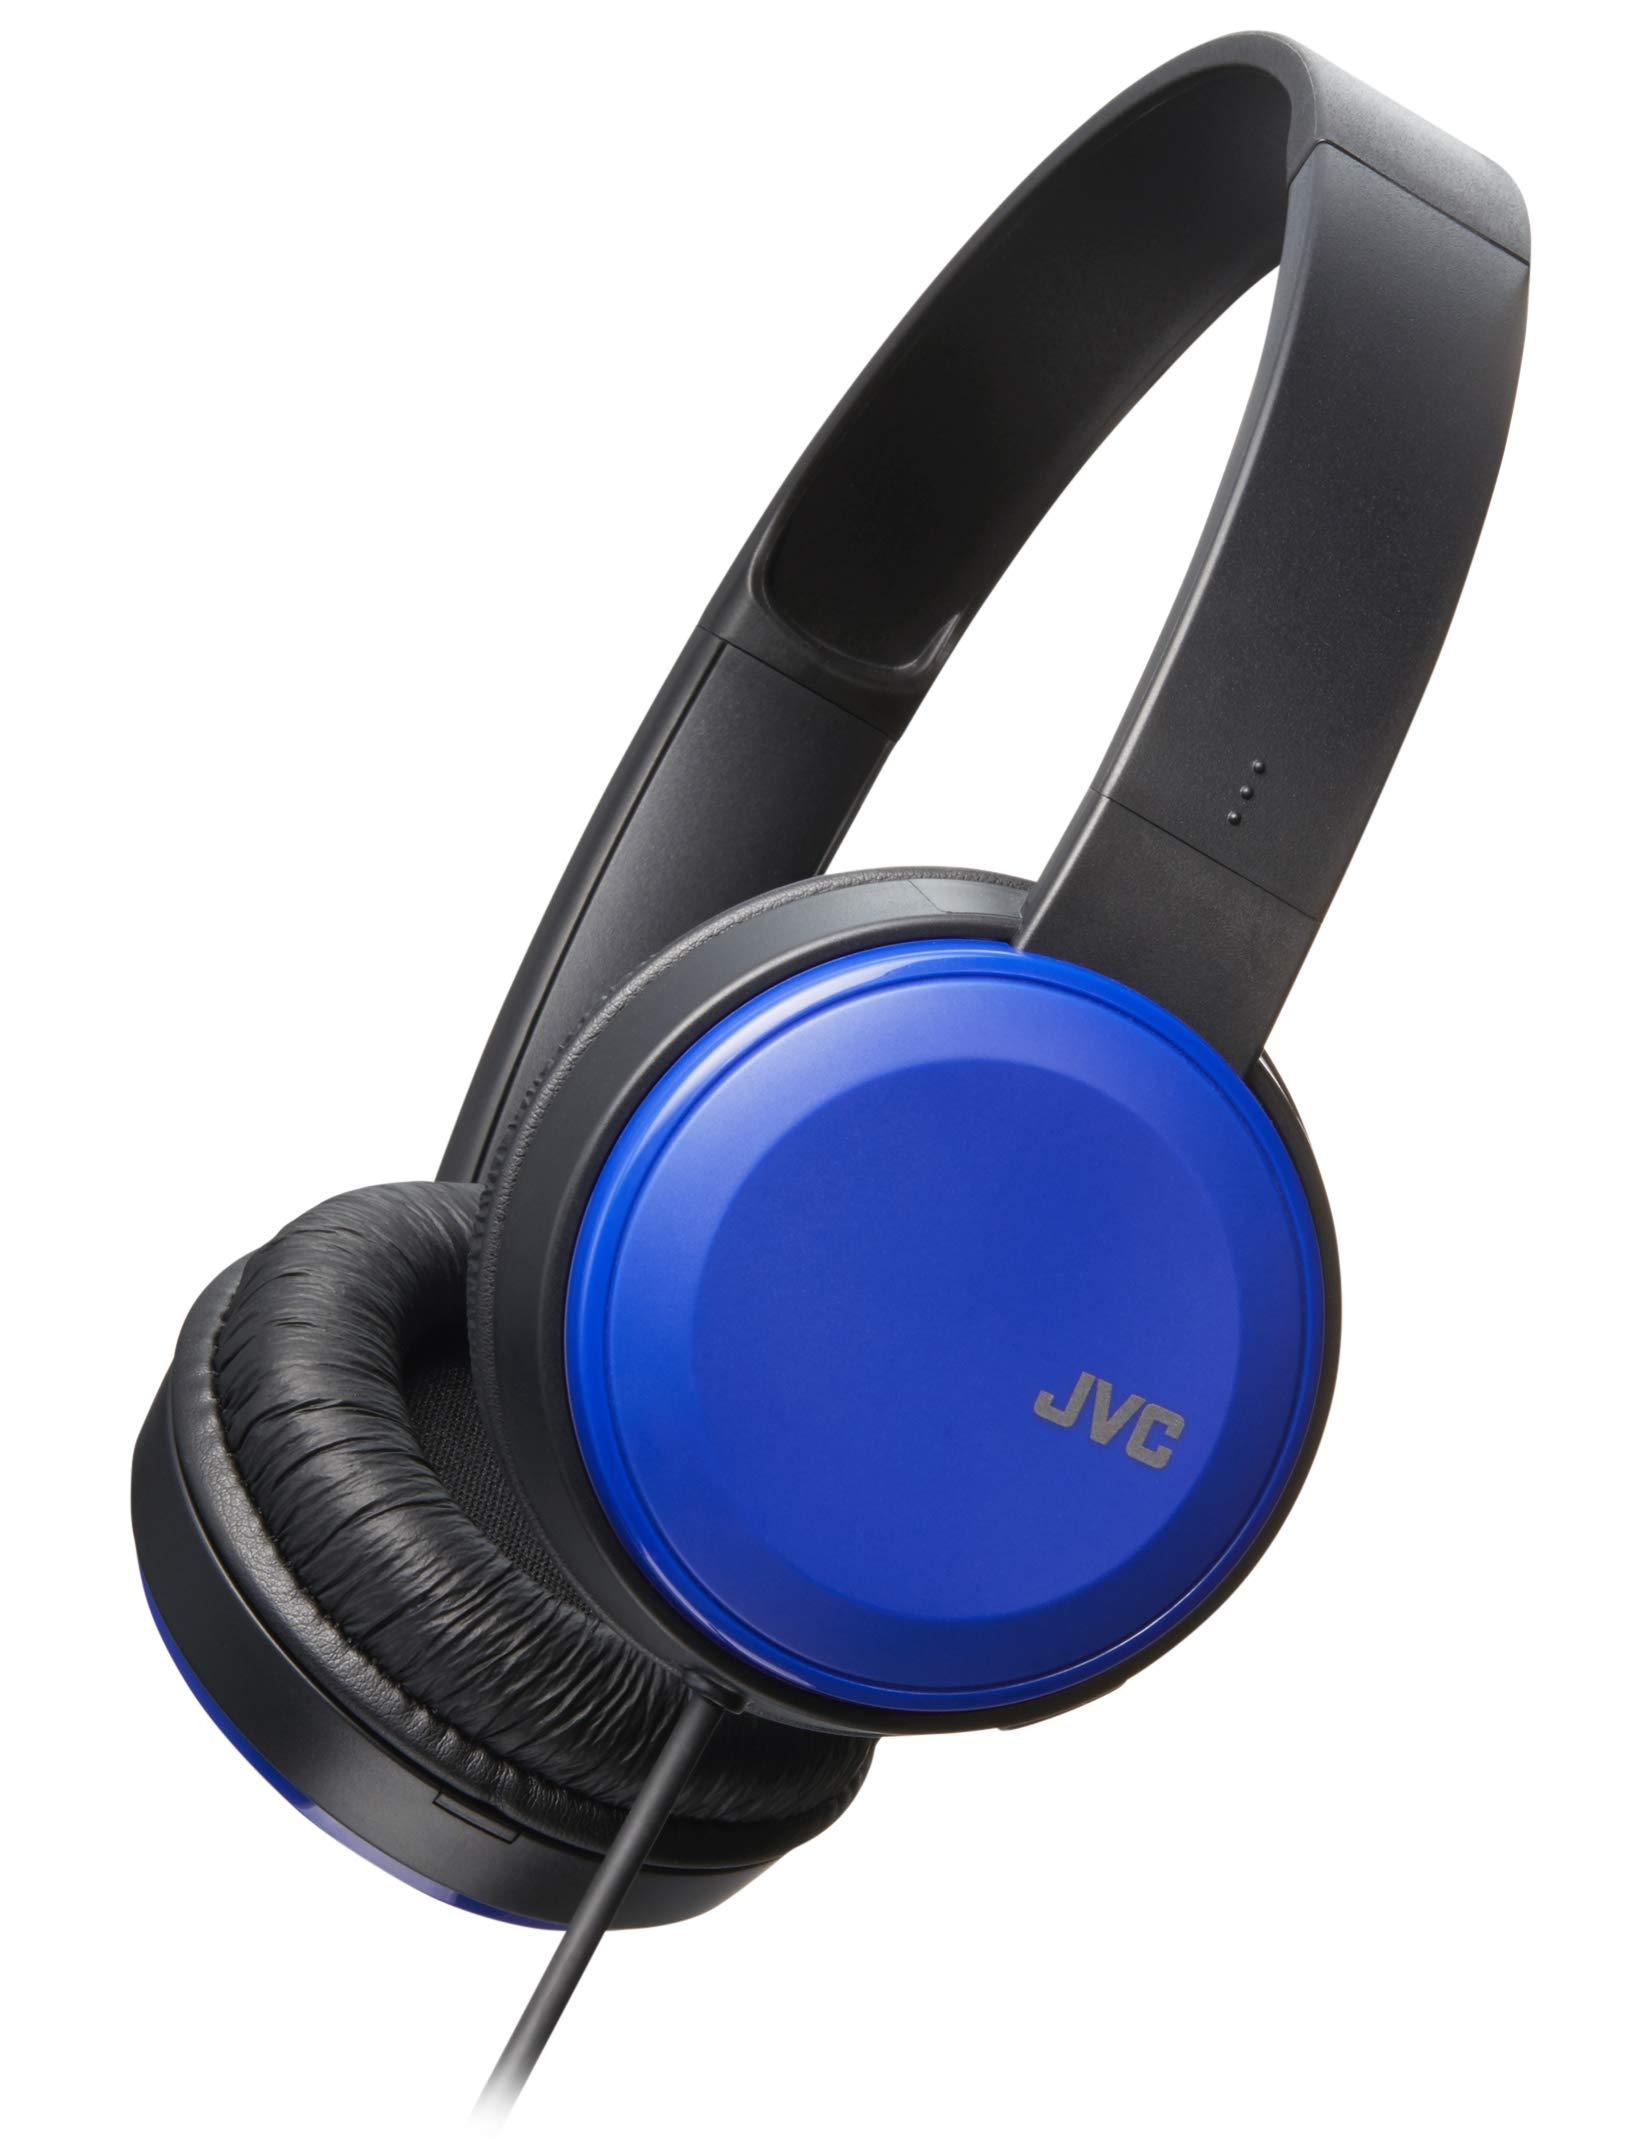 Auriculares JVC Liviano Flat Plegable on-Ear Colorful Liviano Headband con Mic Blue (HAS190MA)